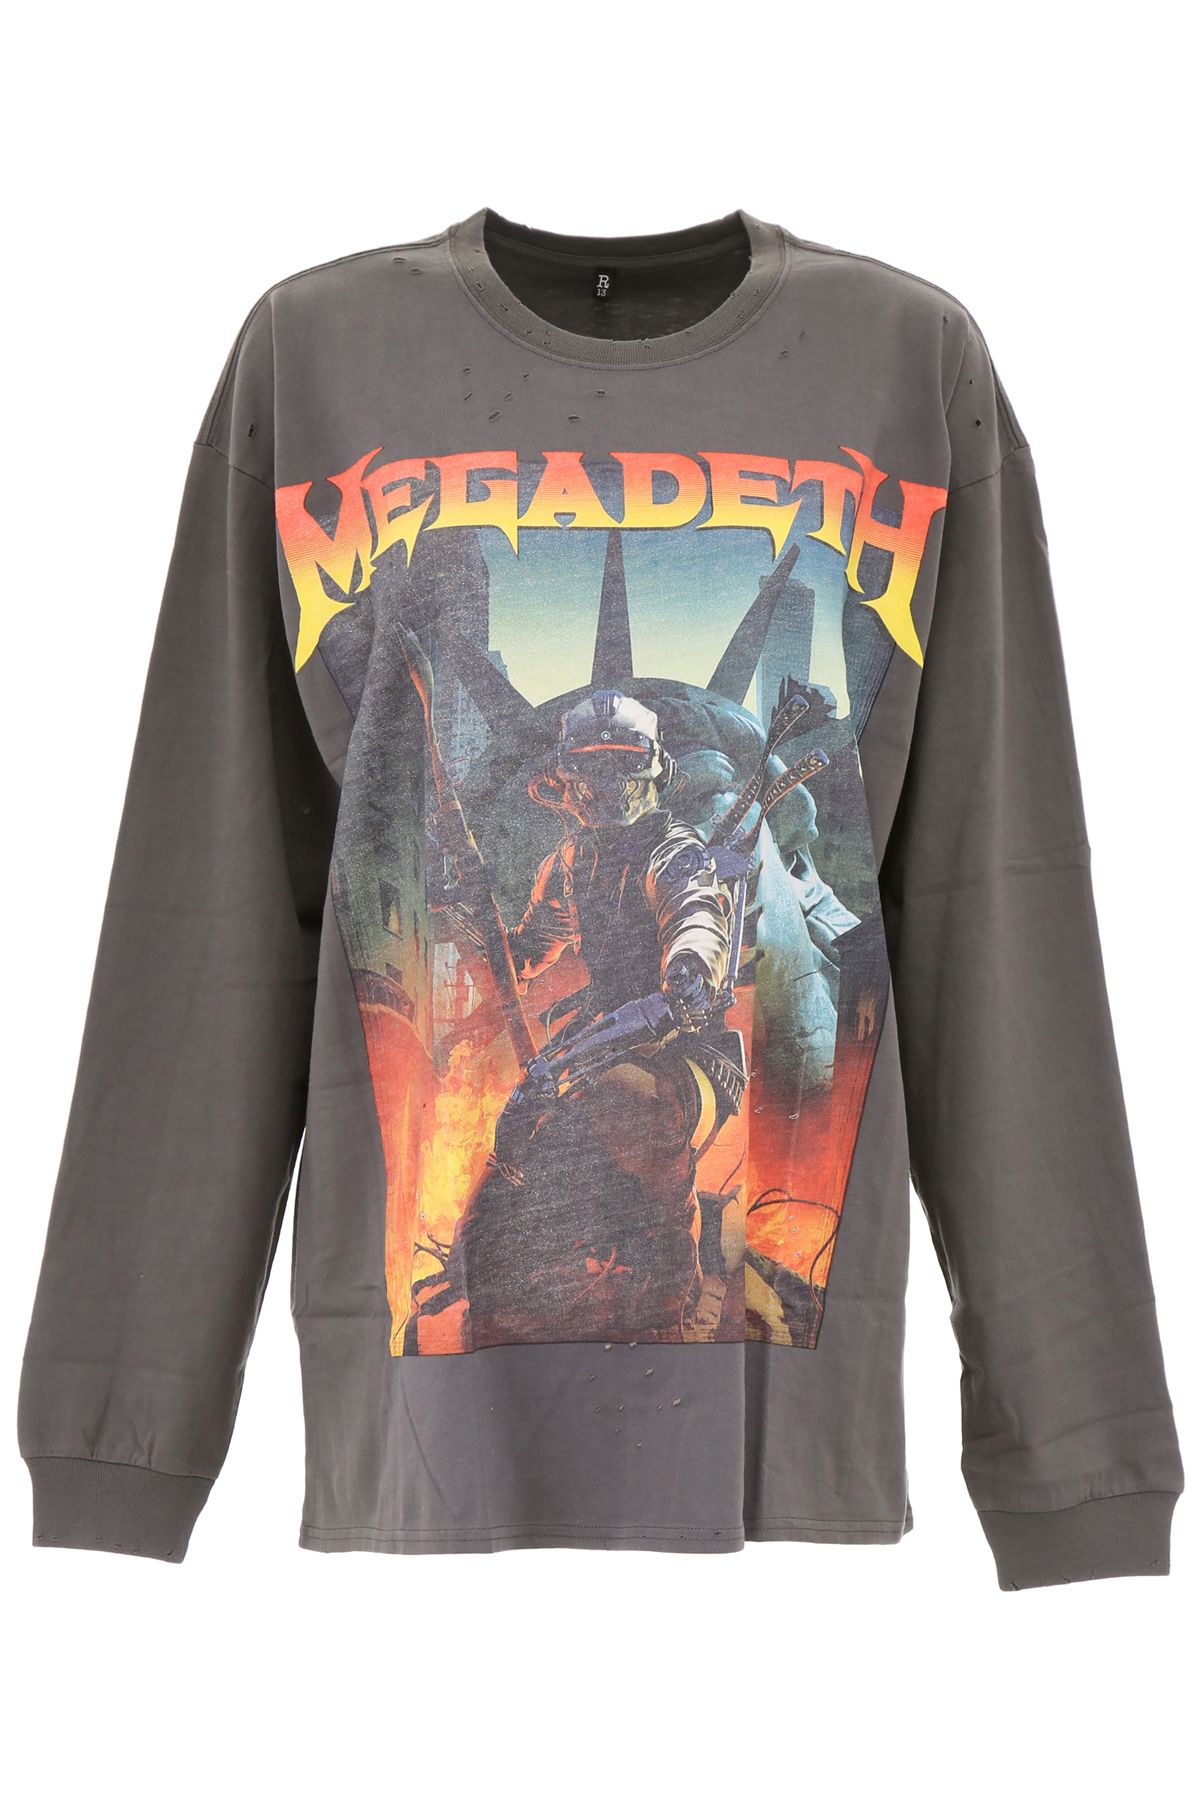 169ef2e010 R13 R13 Megadeth T-shirt - OLD BLACK (Green) - 10719315 | italist